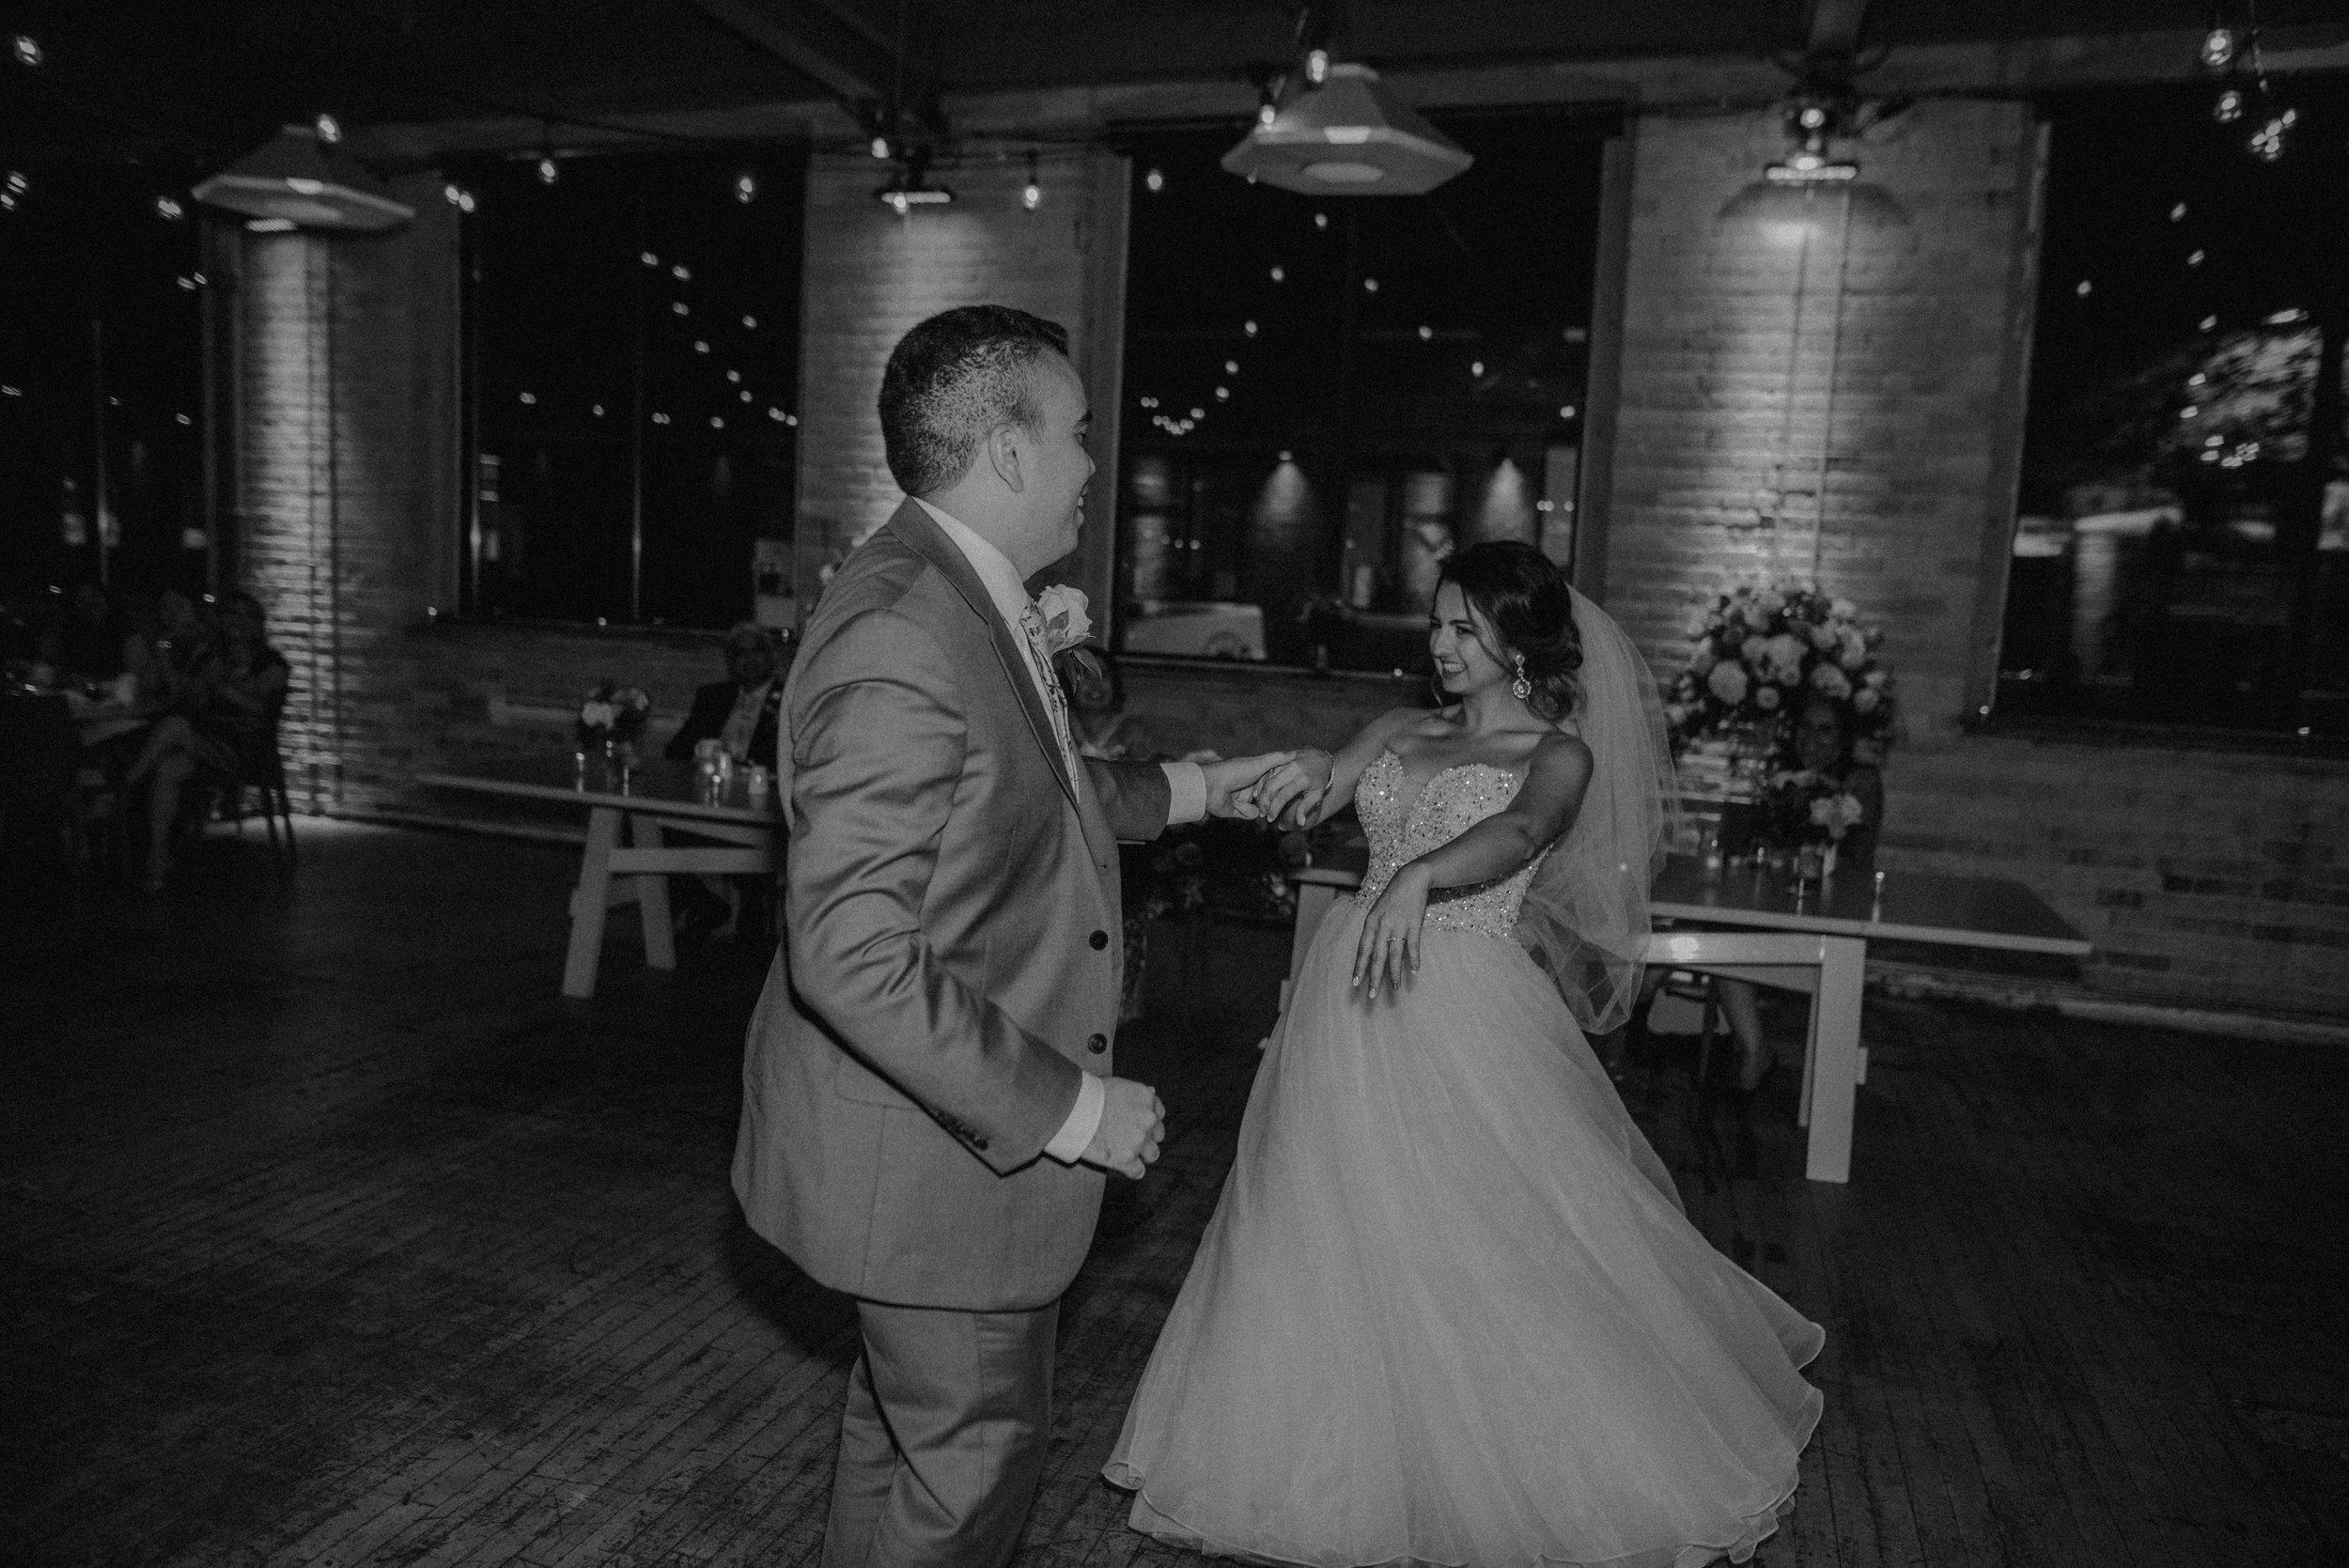 mariage_photographe_toronto_gatineau_ottawa_photographer_wedding-9.jpg